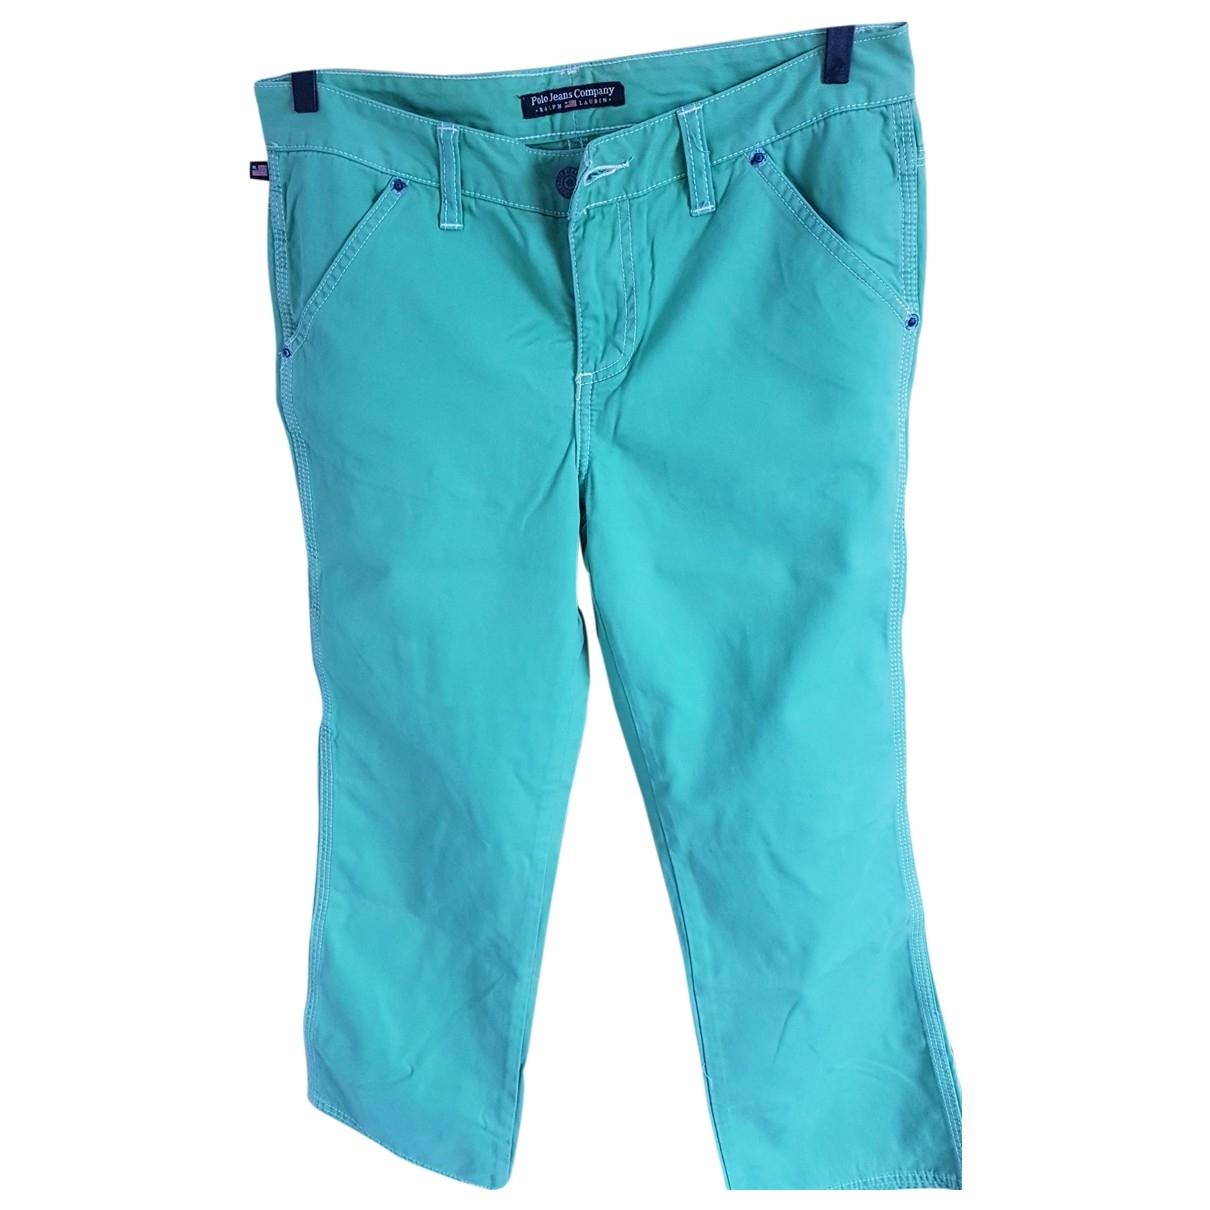 Polo Ralph Lauren \N Green Cotton Trousers for Women 32 FR